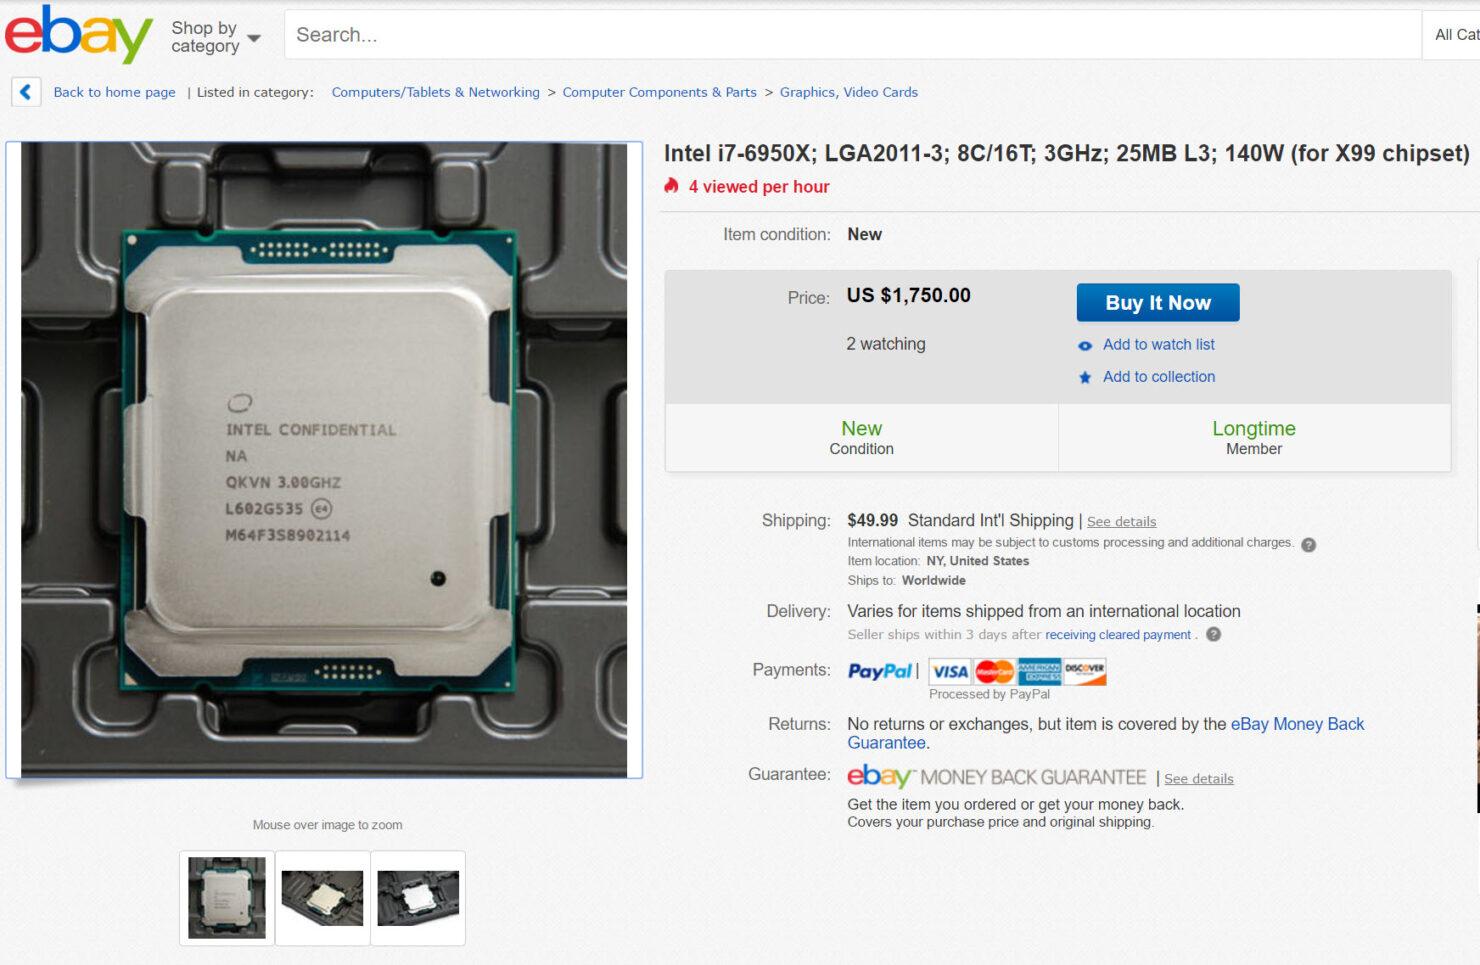 intel-core-i7-6950x-ebay